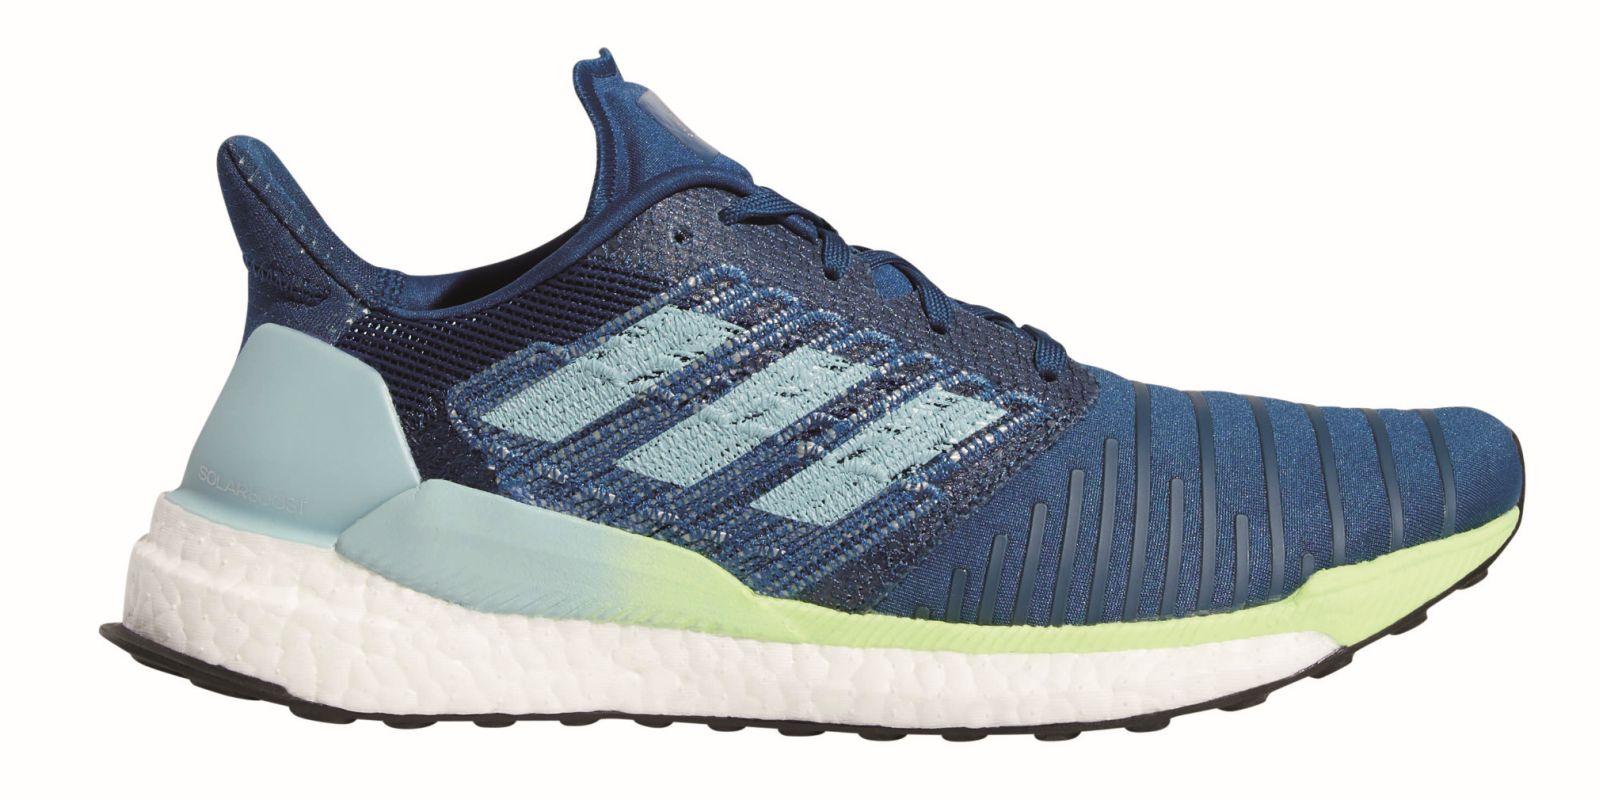 adidas Performance Herren Laufschuh SOLAR BOOST M marine blau